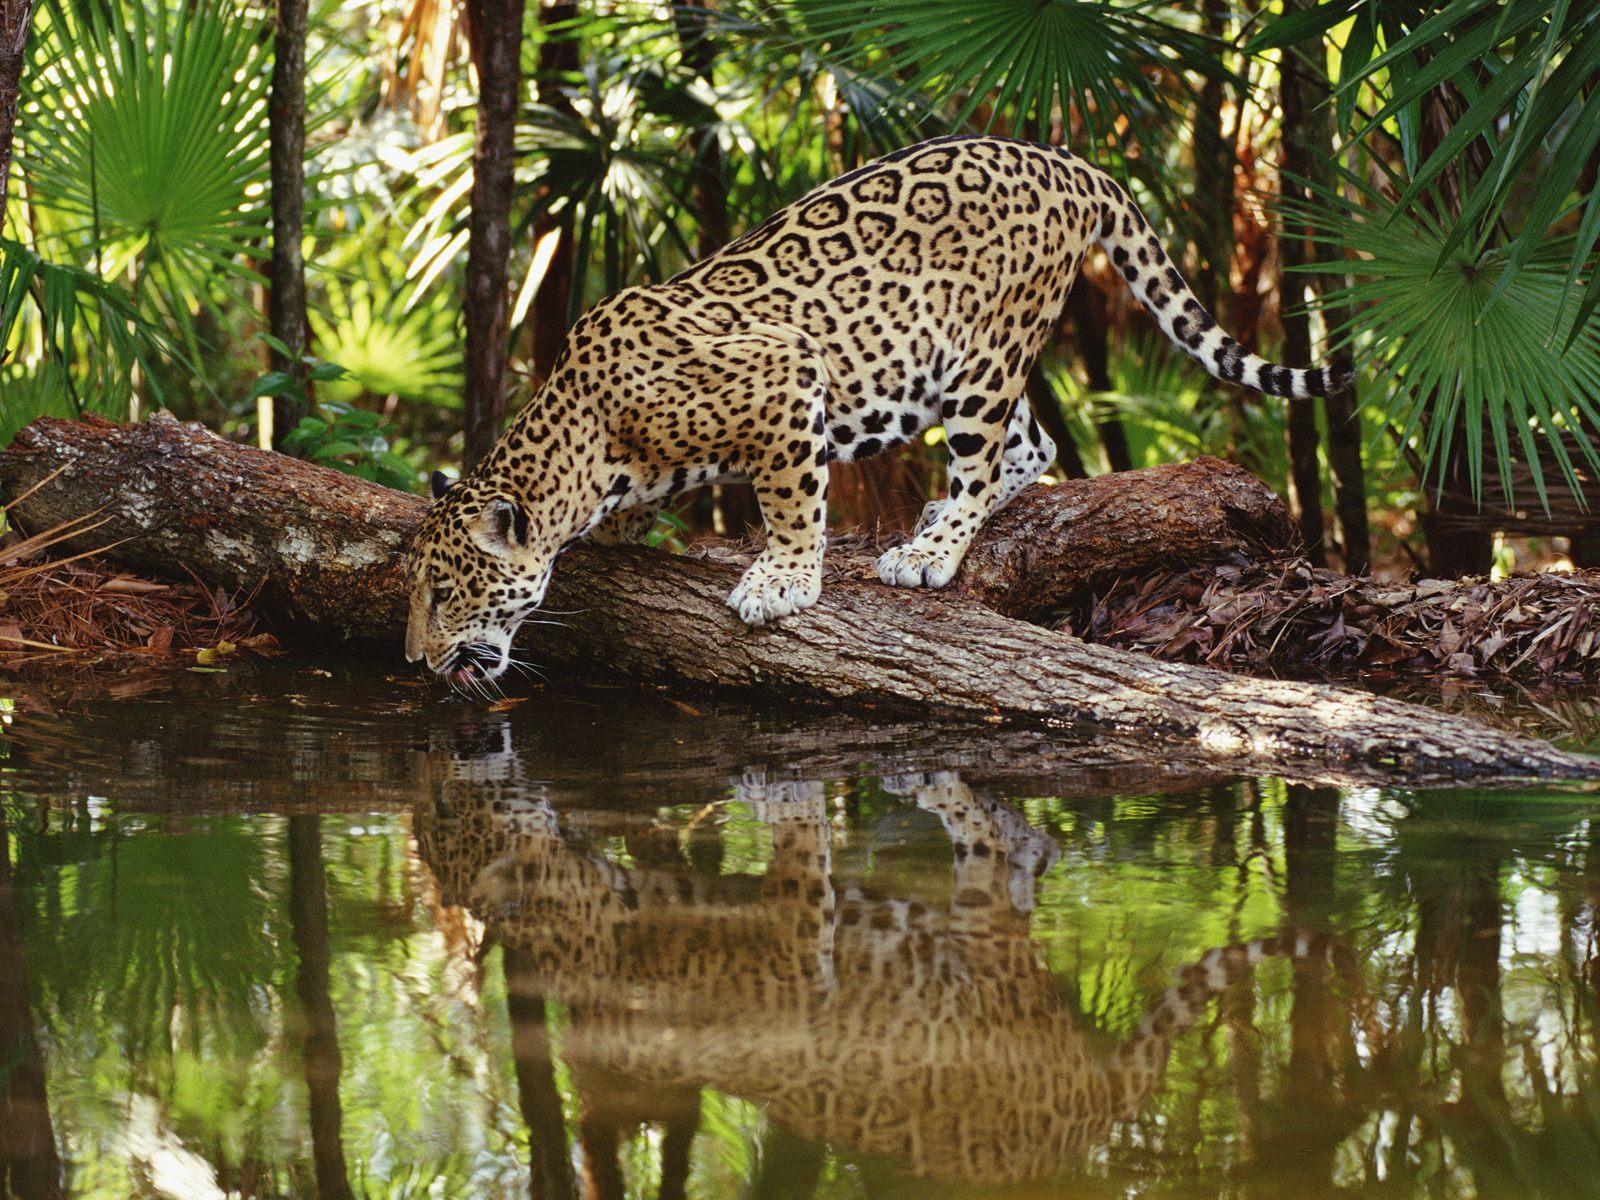 Rainforest Cafe Animal Names